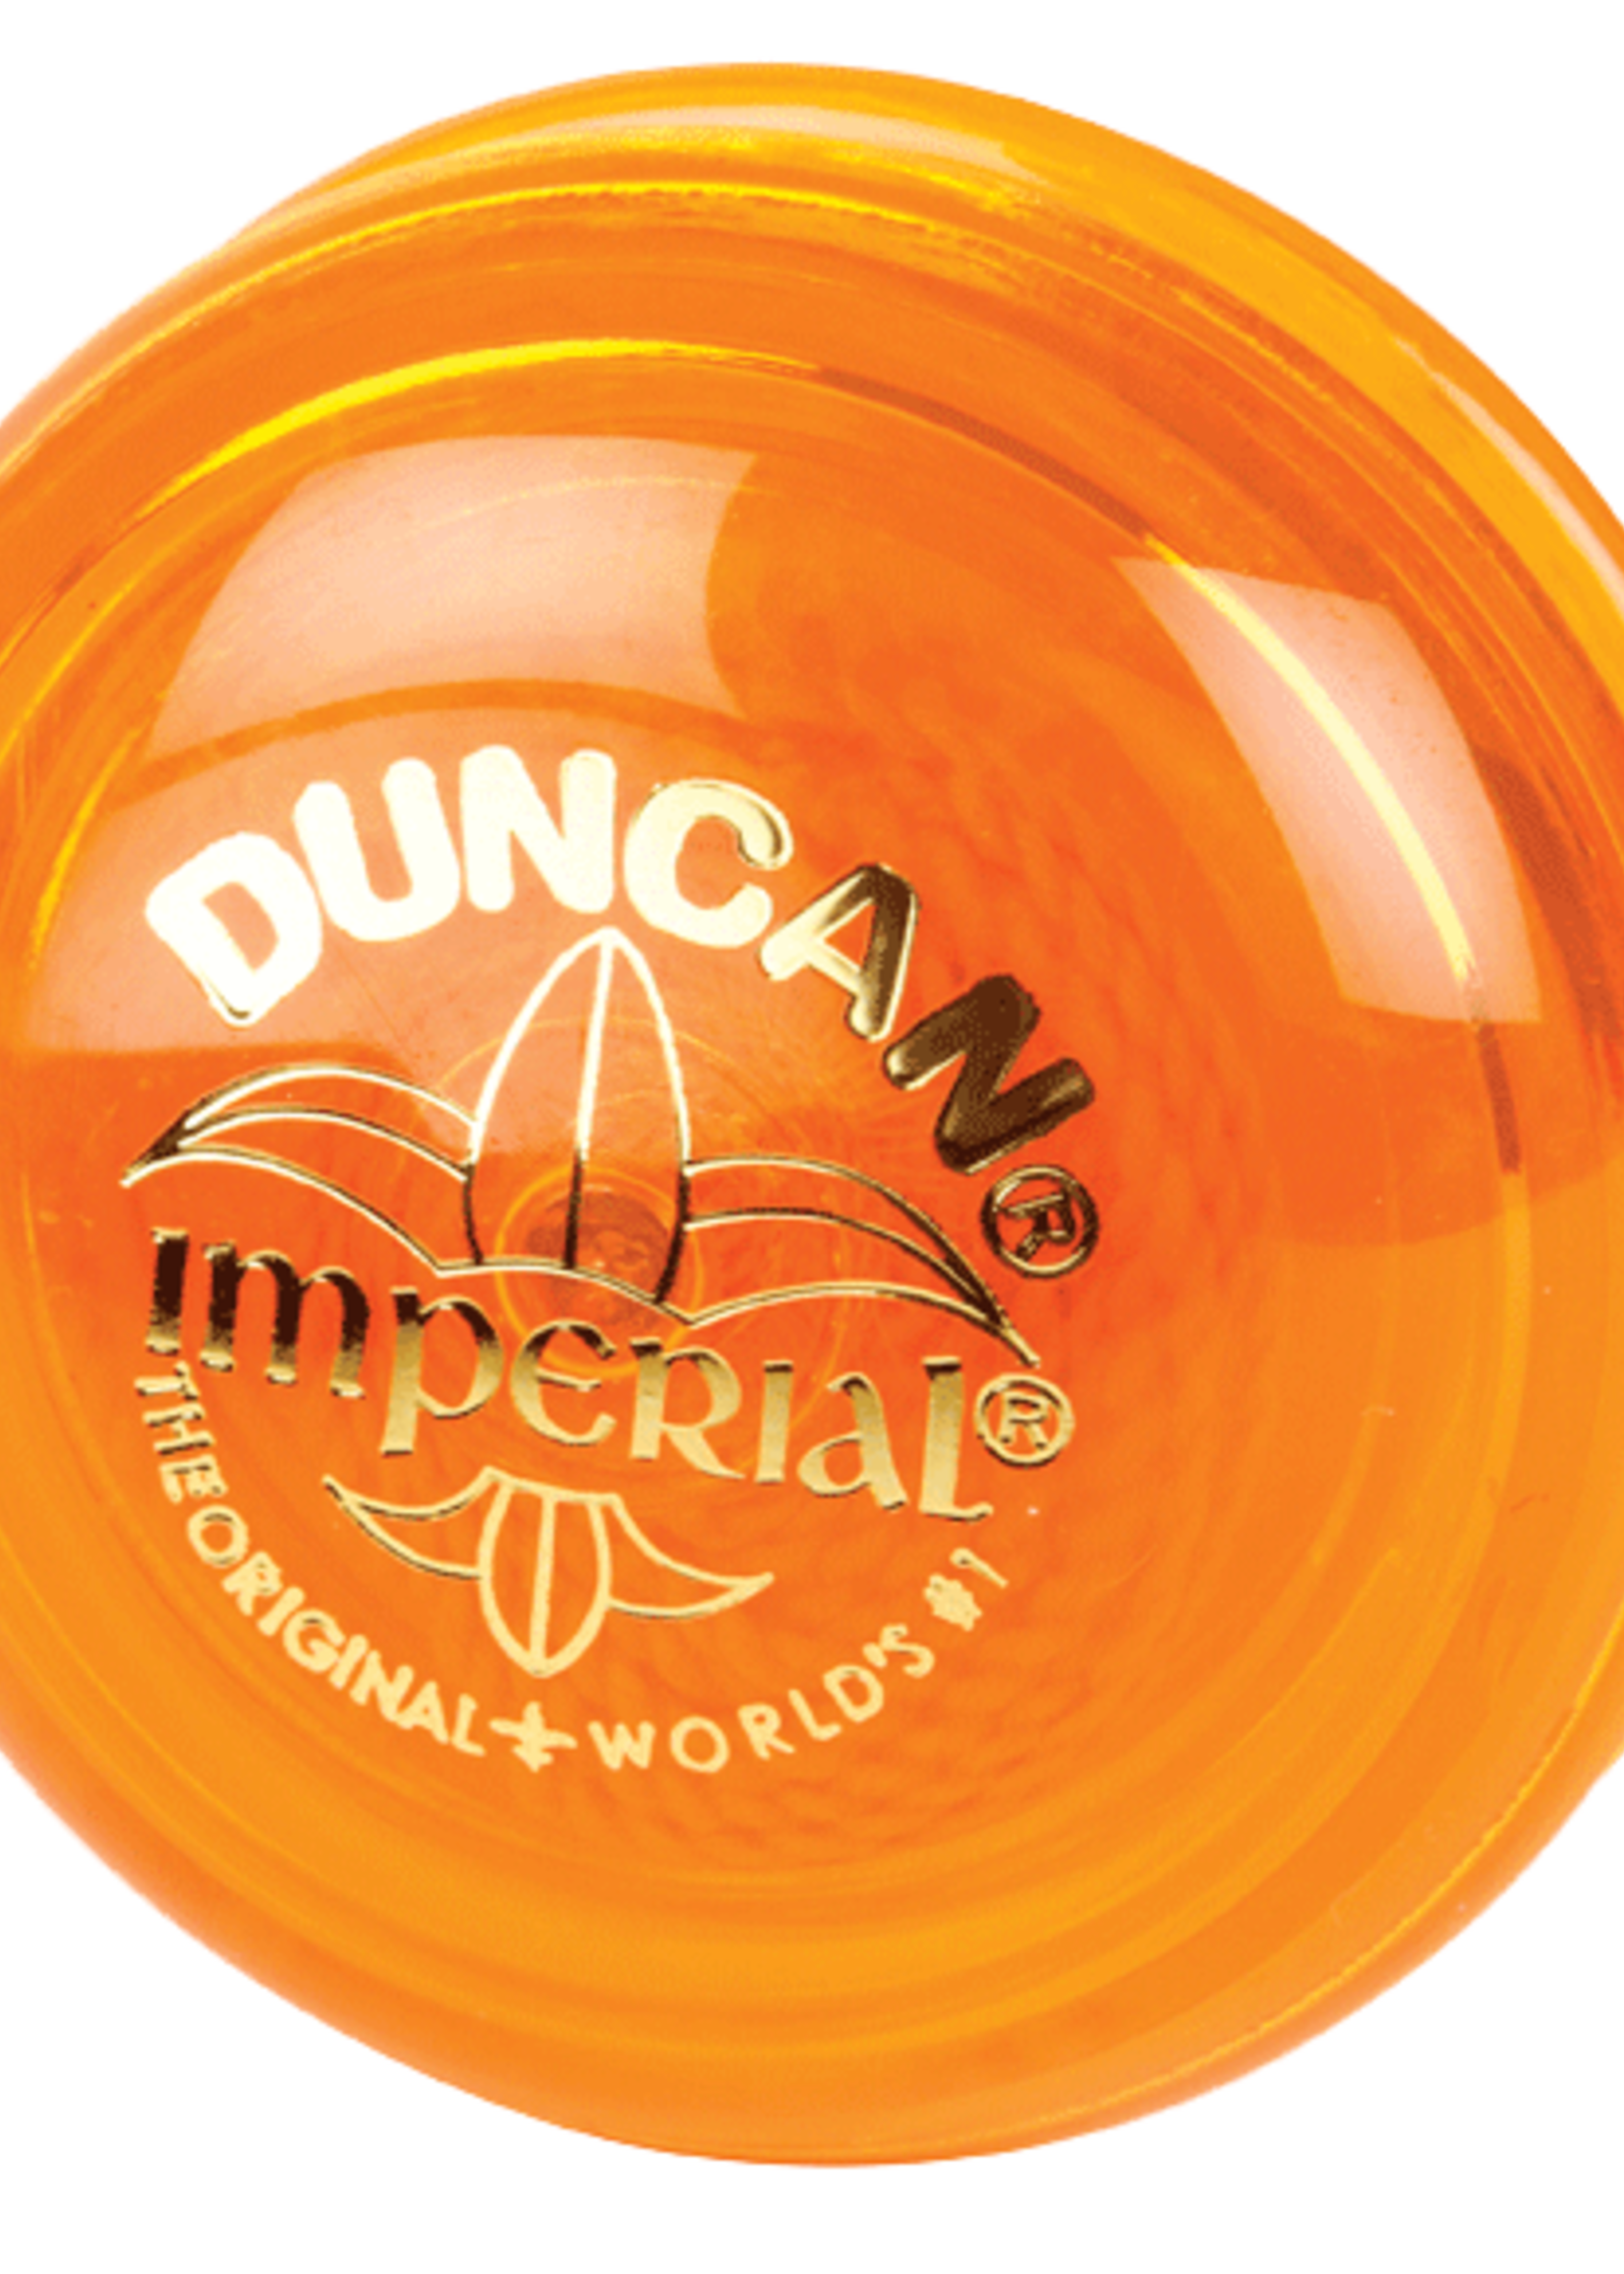 Duncan Imperial Assortment yoyo